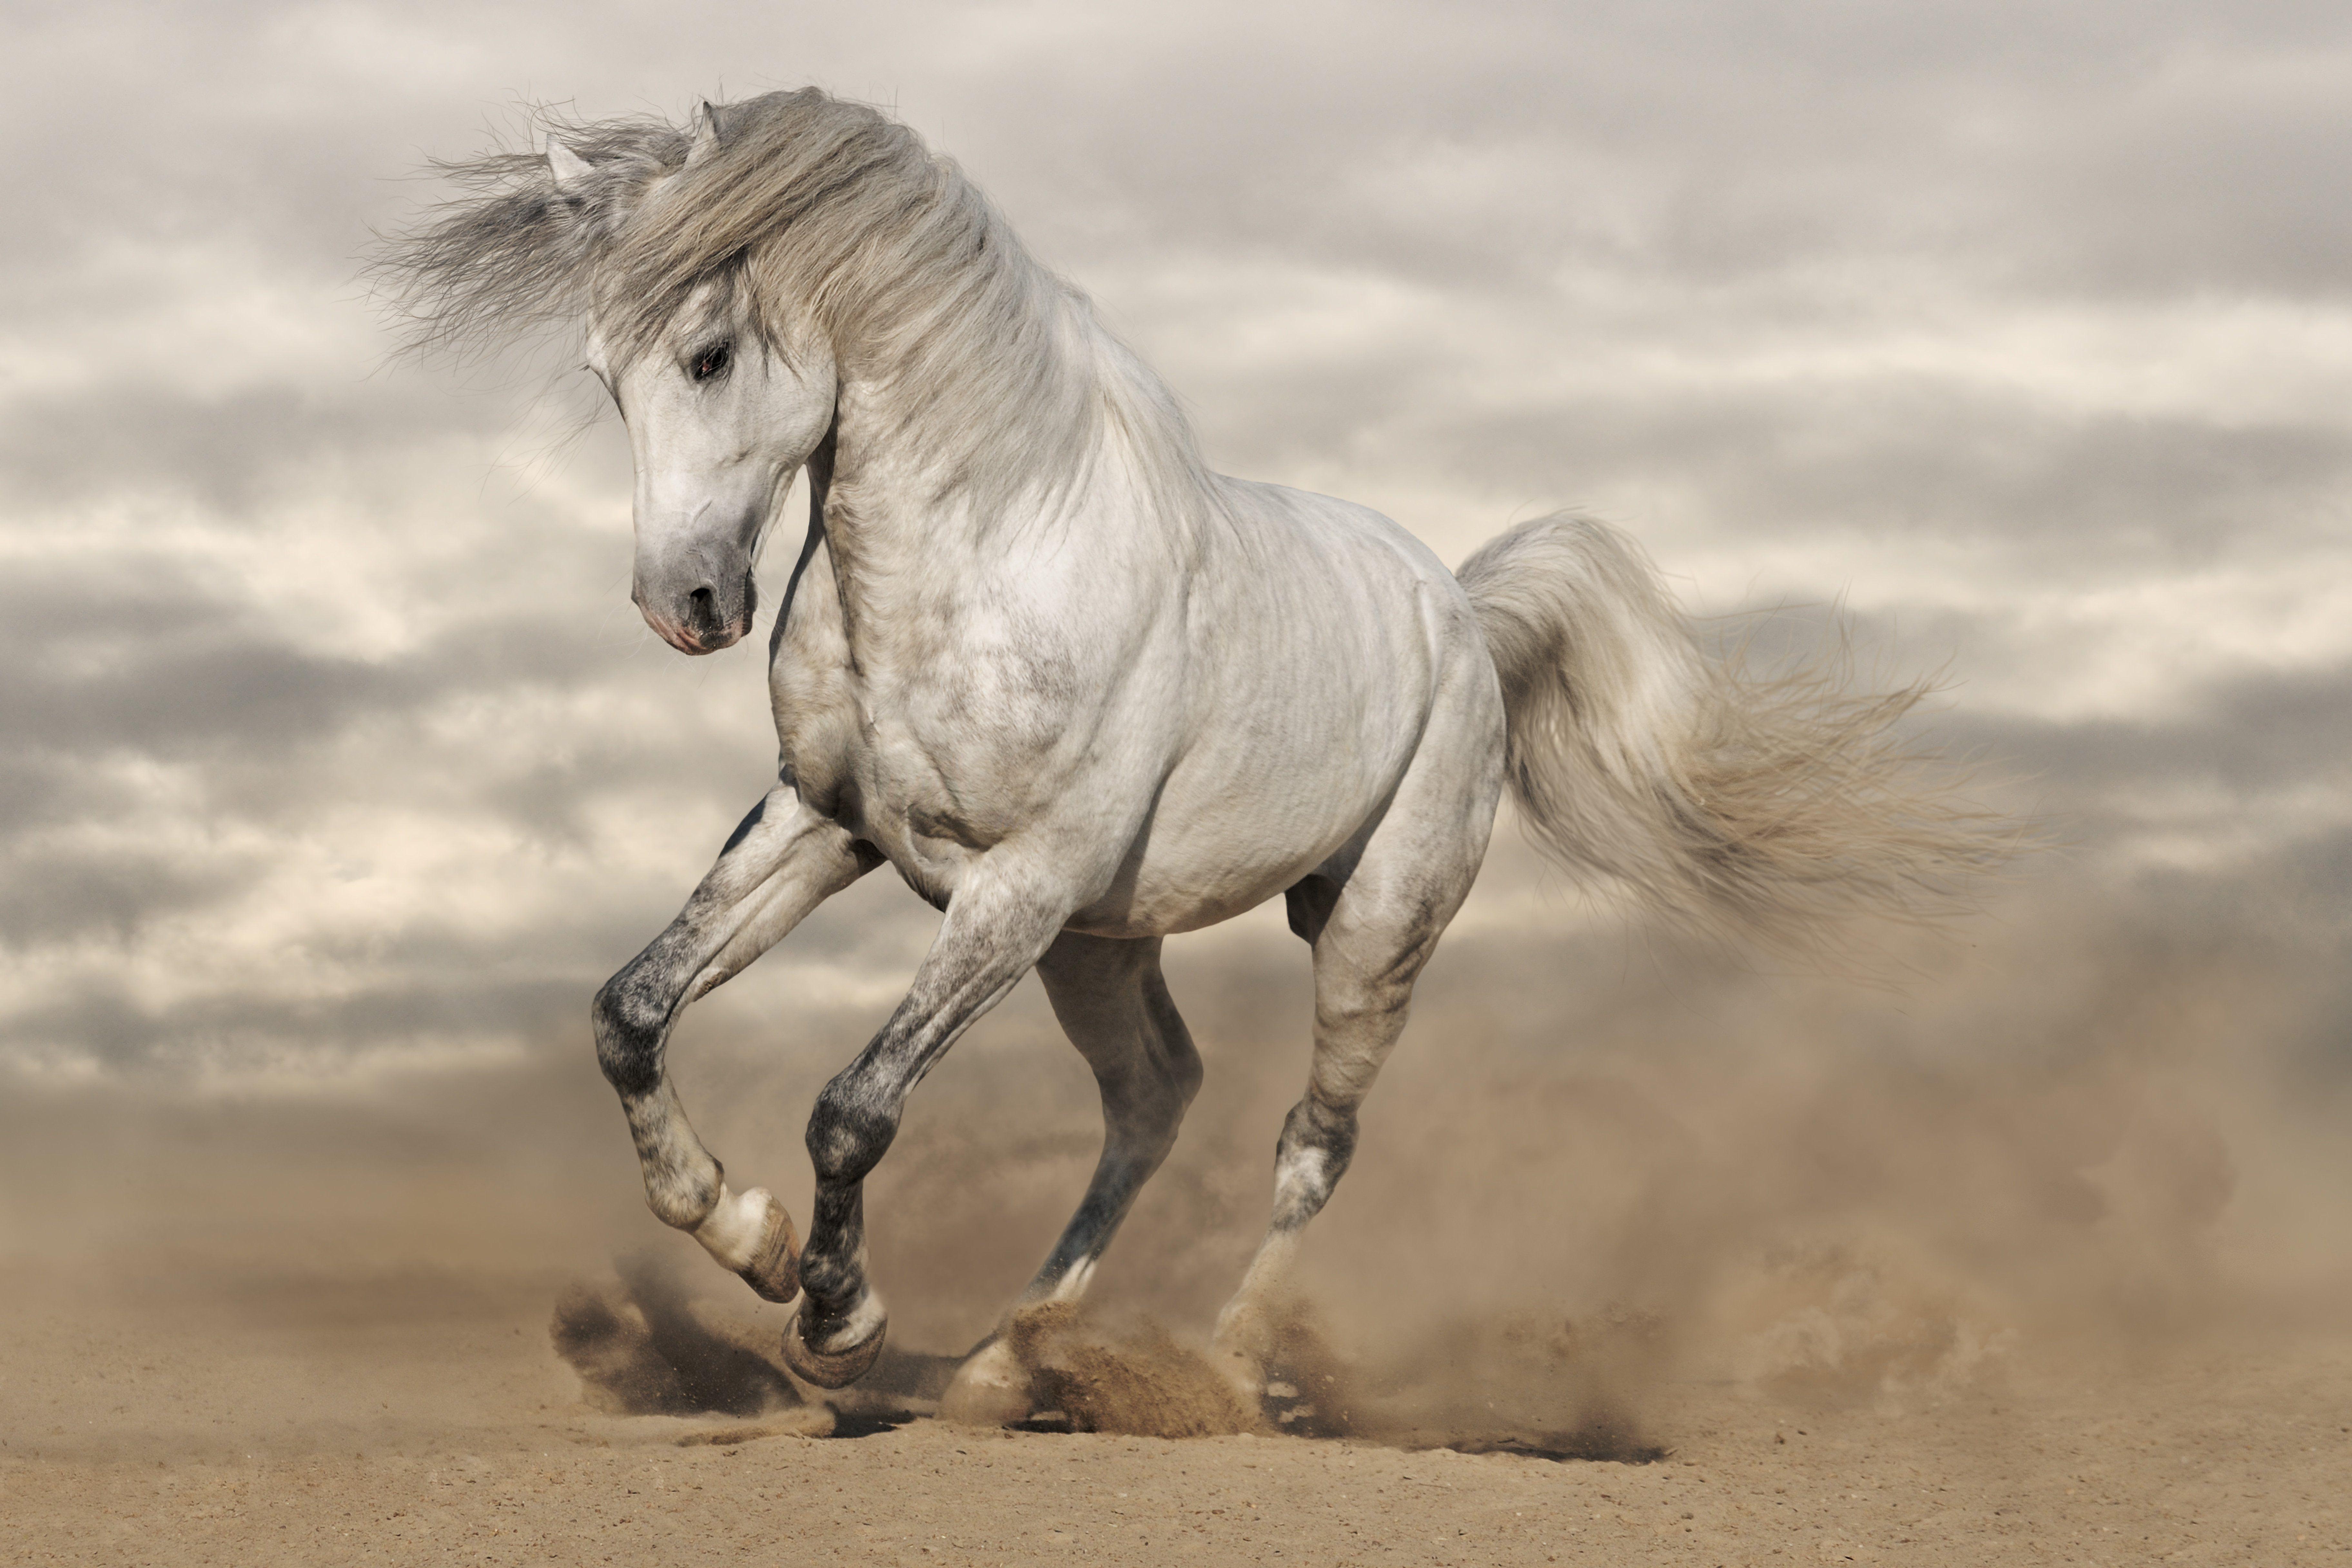 Black Horse Hd Desktop Wallpaper Widescreen High Definition Horse Wallpaper Horses White Horse Images